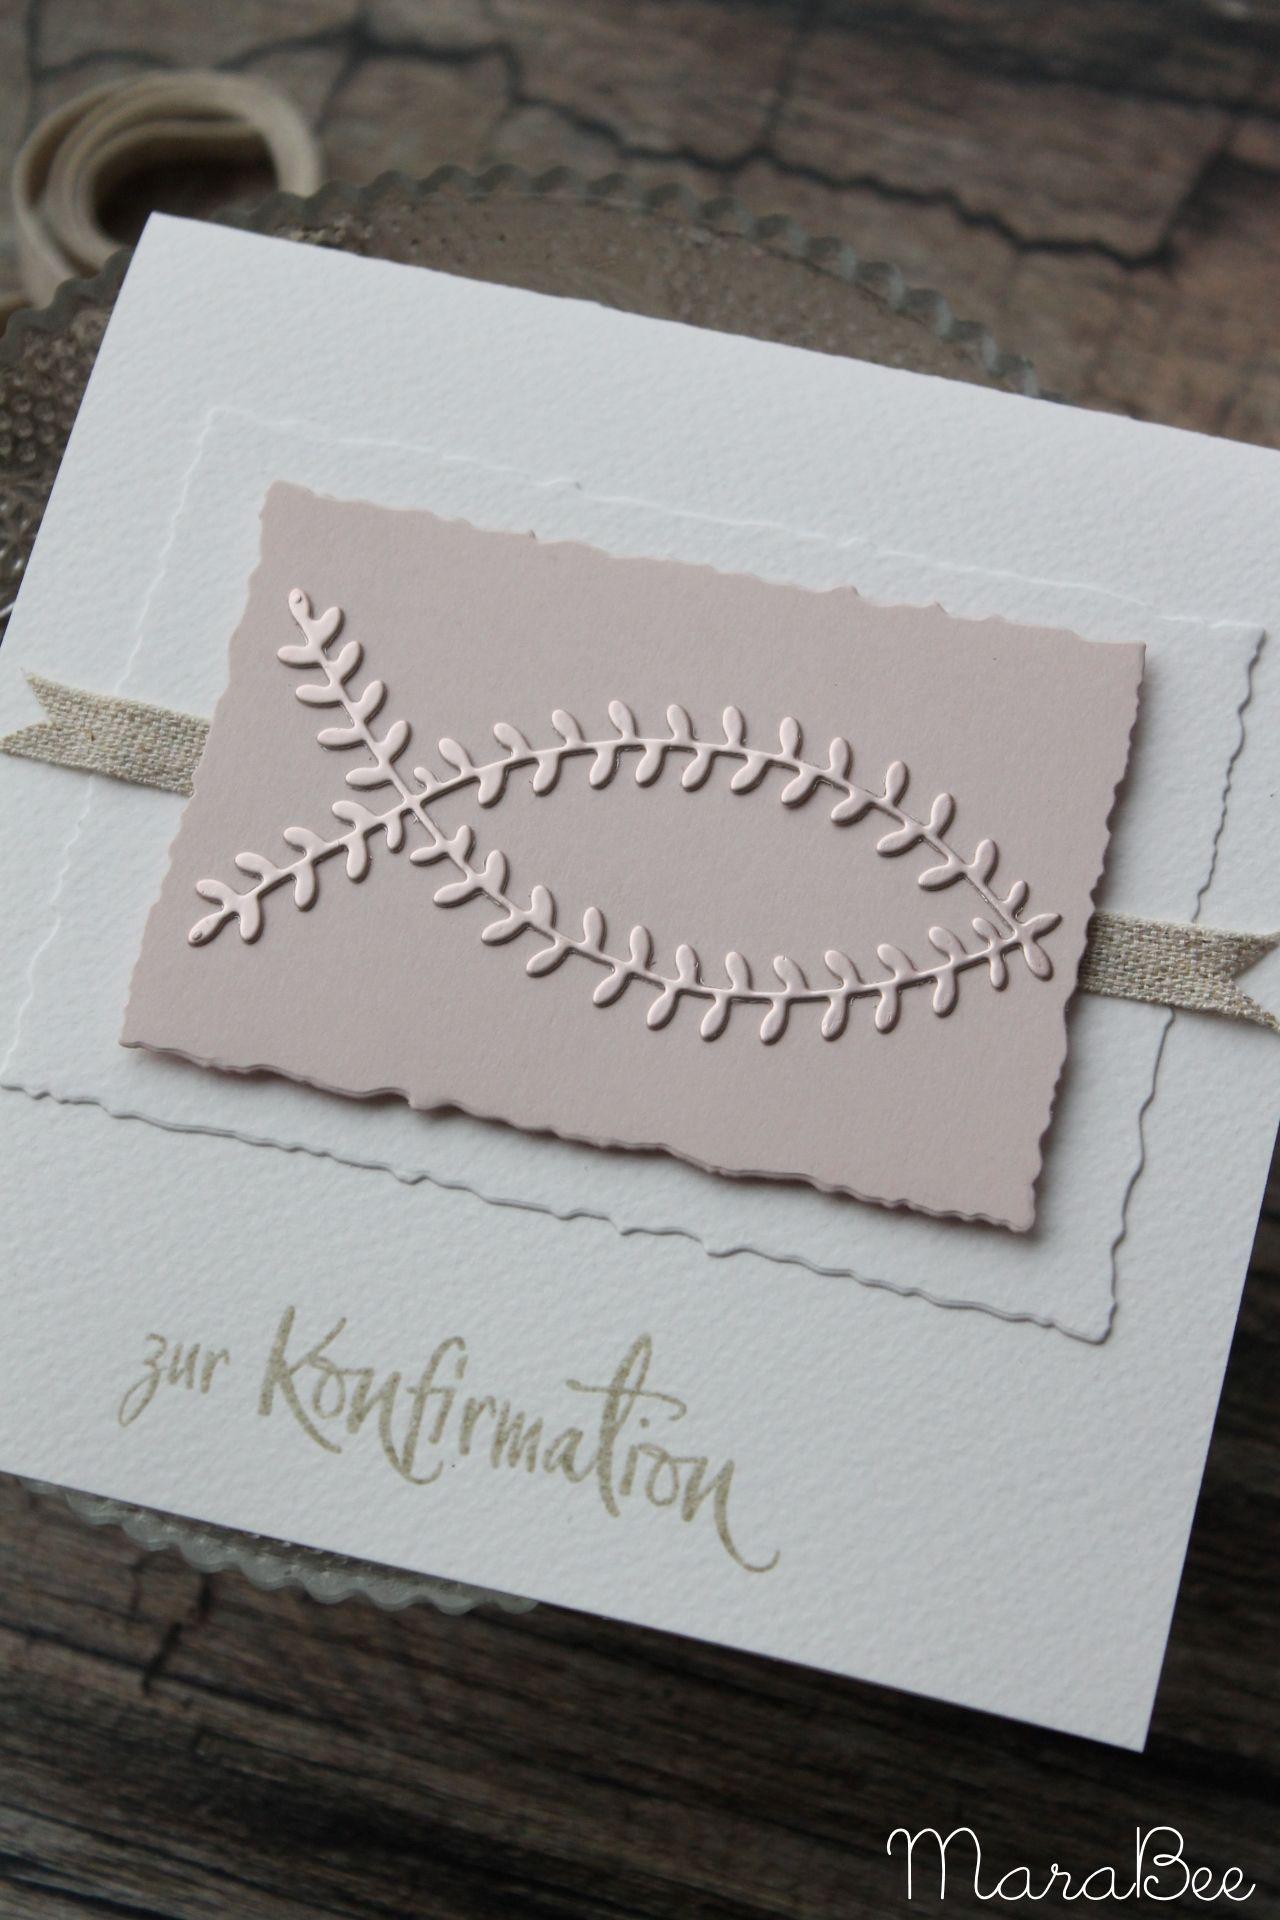 Konfirmationskarten Einladung Konfirmation Konfirmation In 2020 Wedding Invitation Wording Casual Wedding Invitation Wording Examples Wedding Invitations Diy Rustic